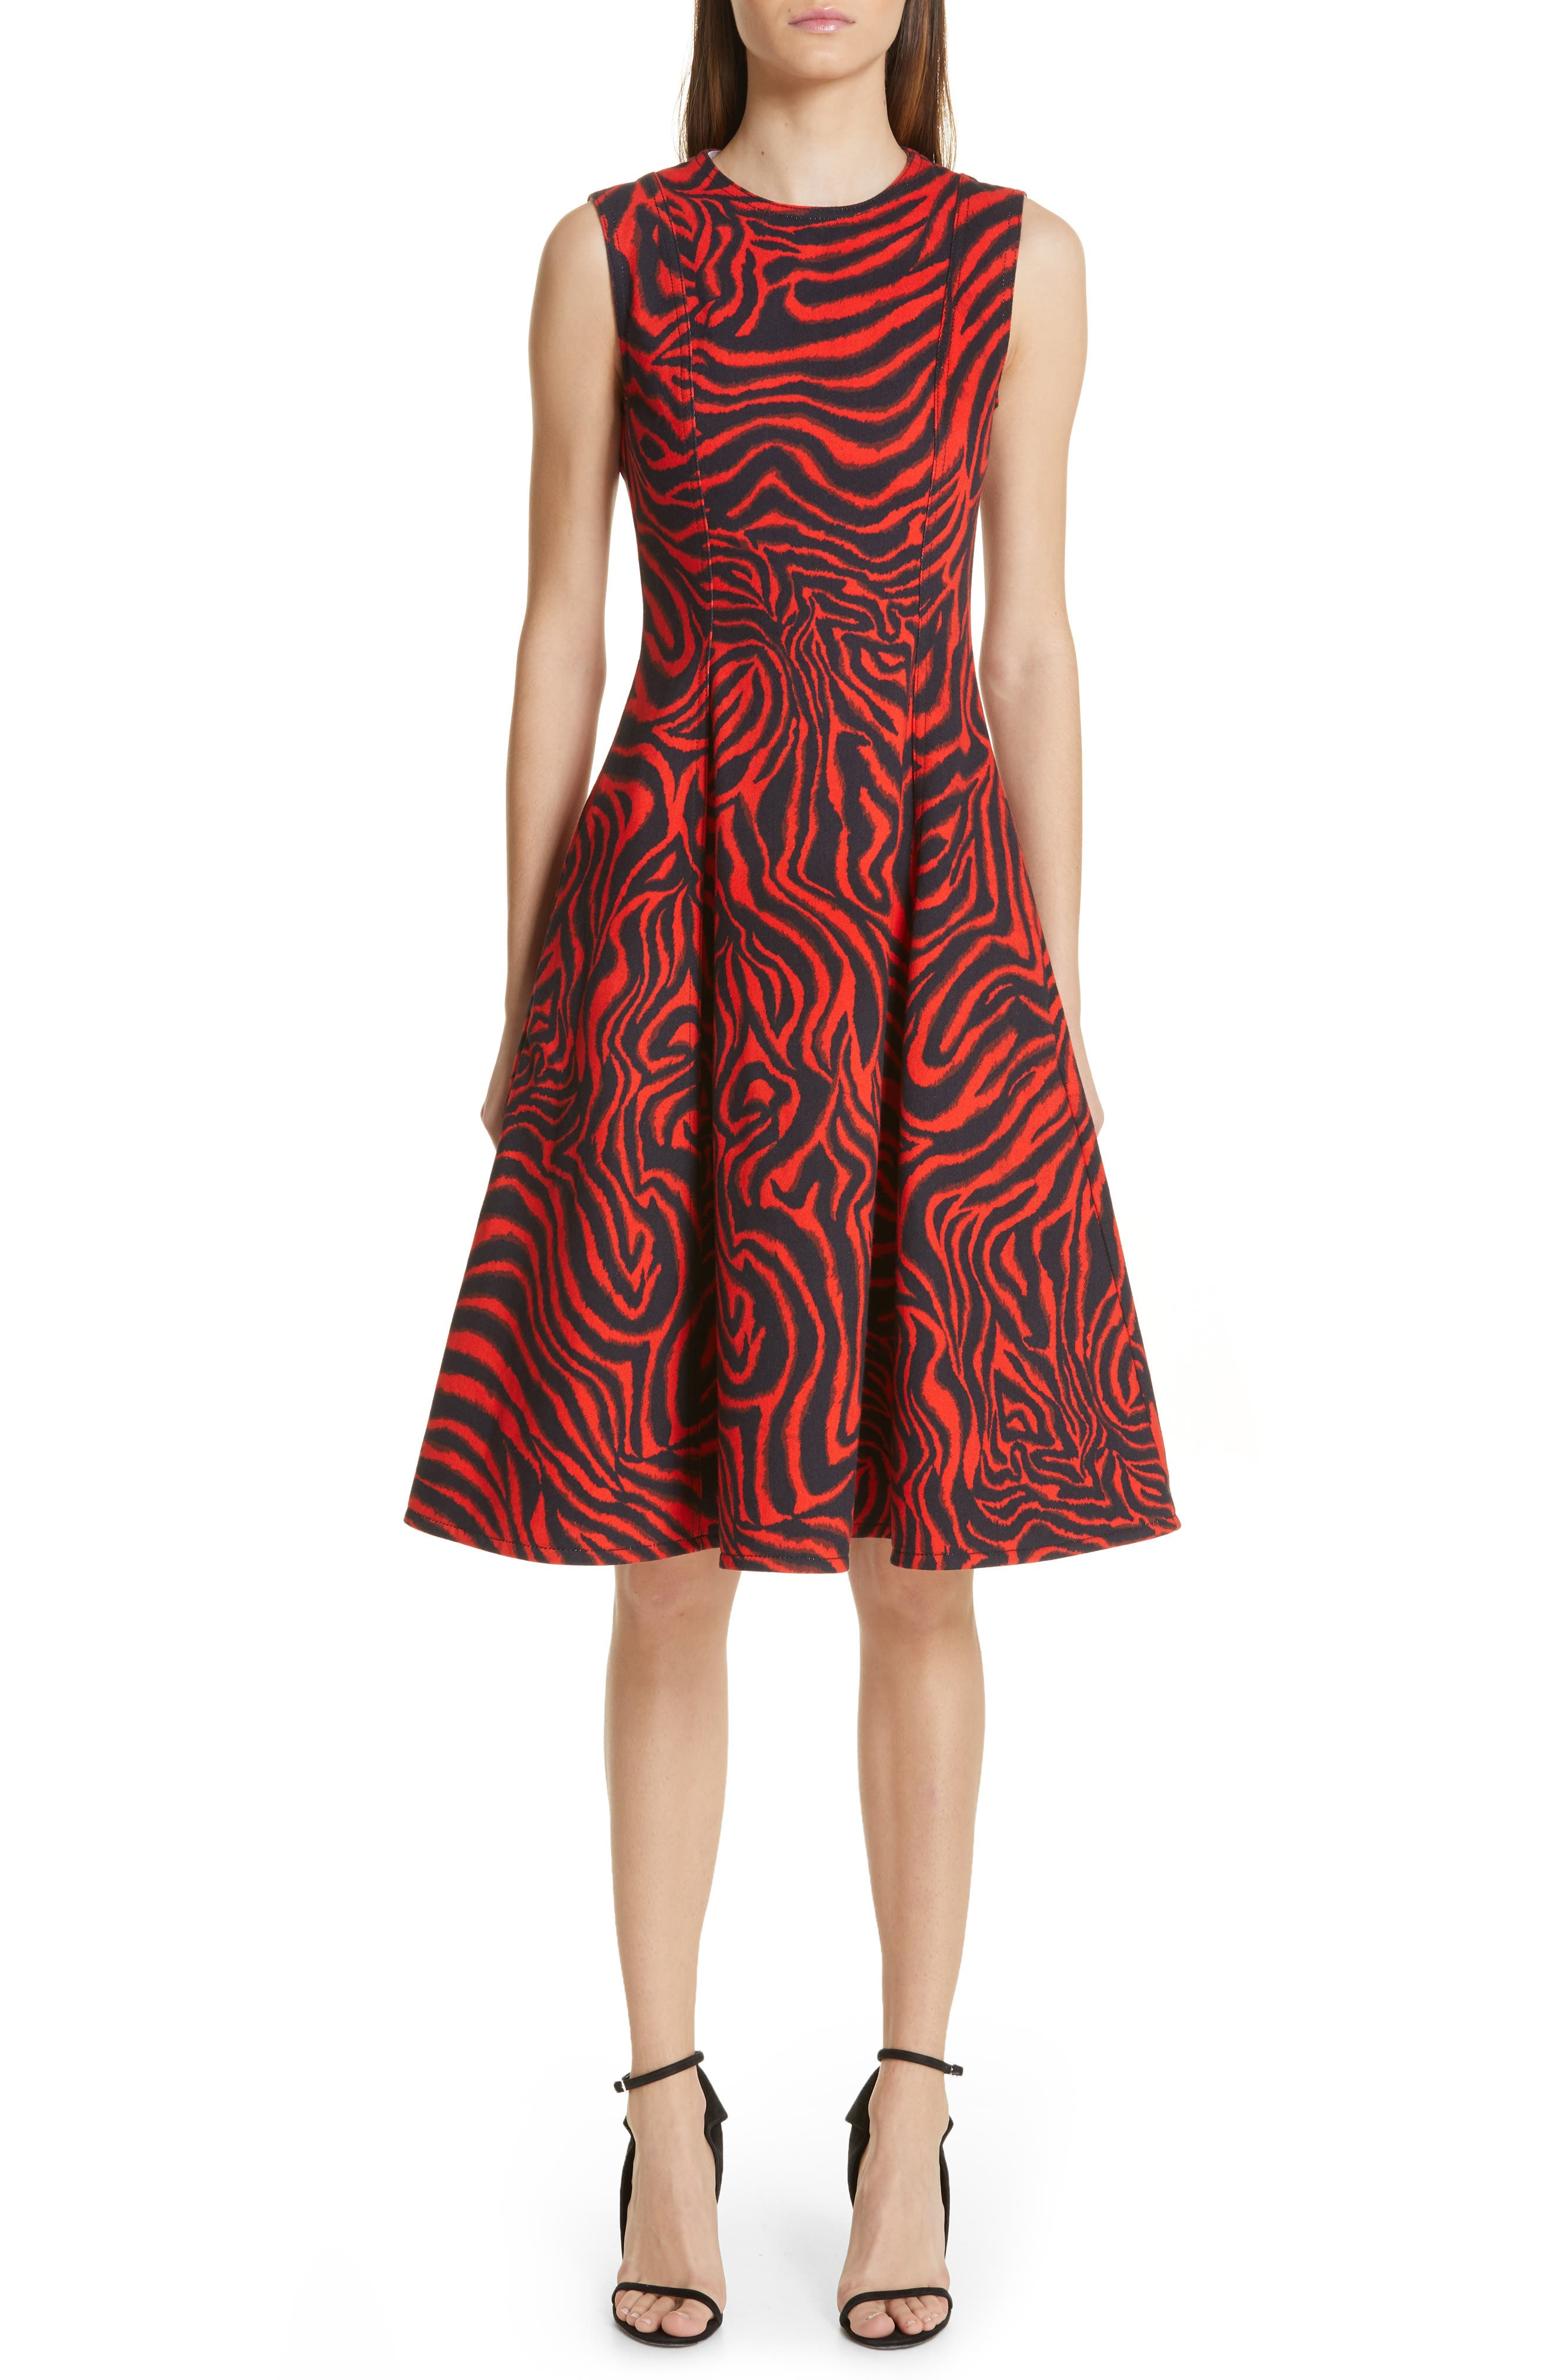 97c3a455c66 Calvin Klein 205W39Nyc Zebra Print Denim A-Line Dress